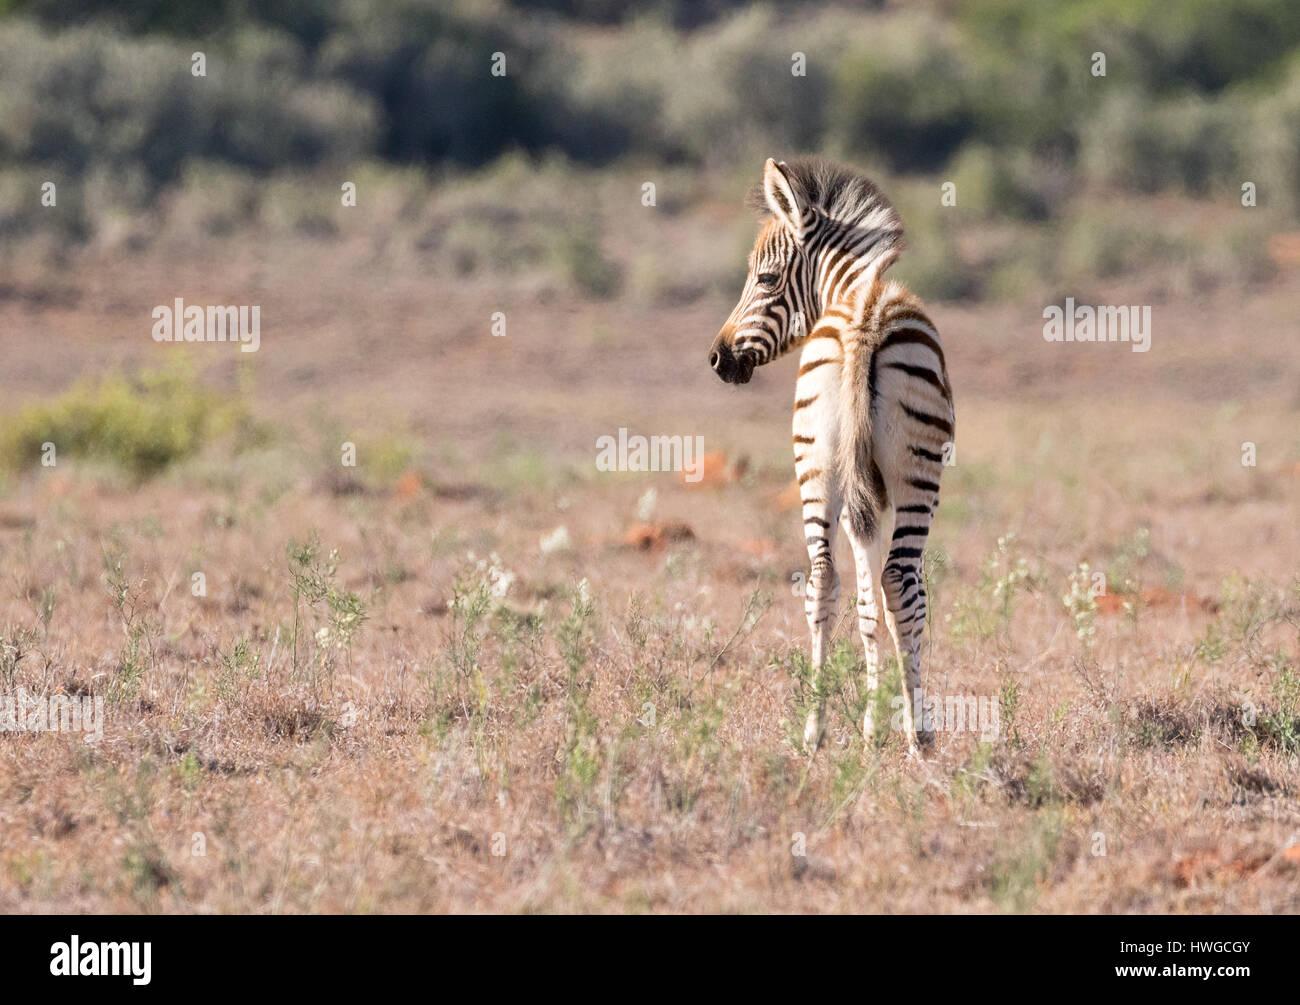 Zebra puledro, baby zebra 3 giorni di età, selvagge, Equus quagga, Sud Africa Immagini Stock